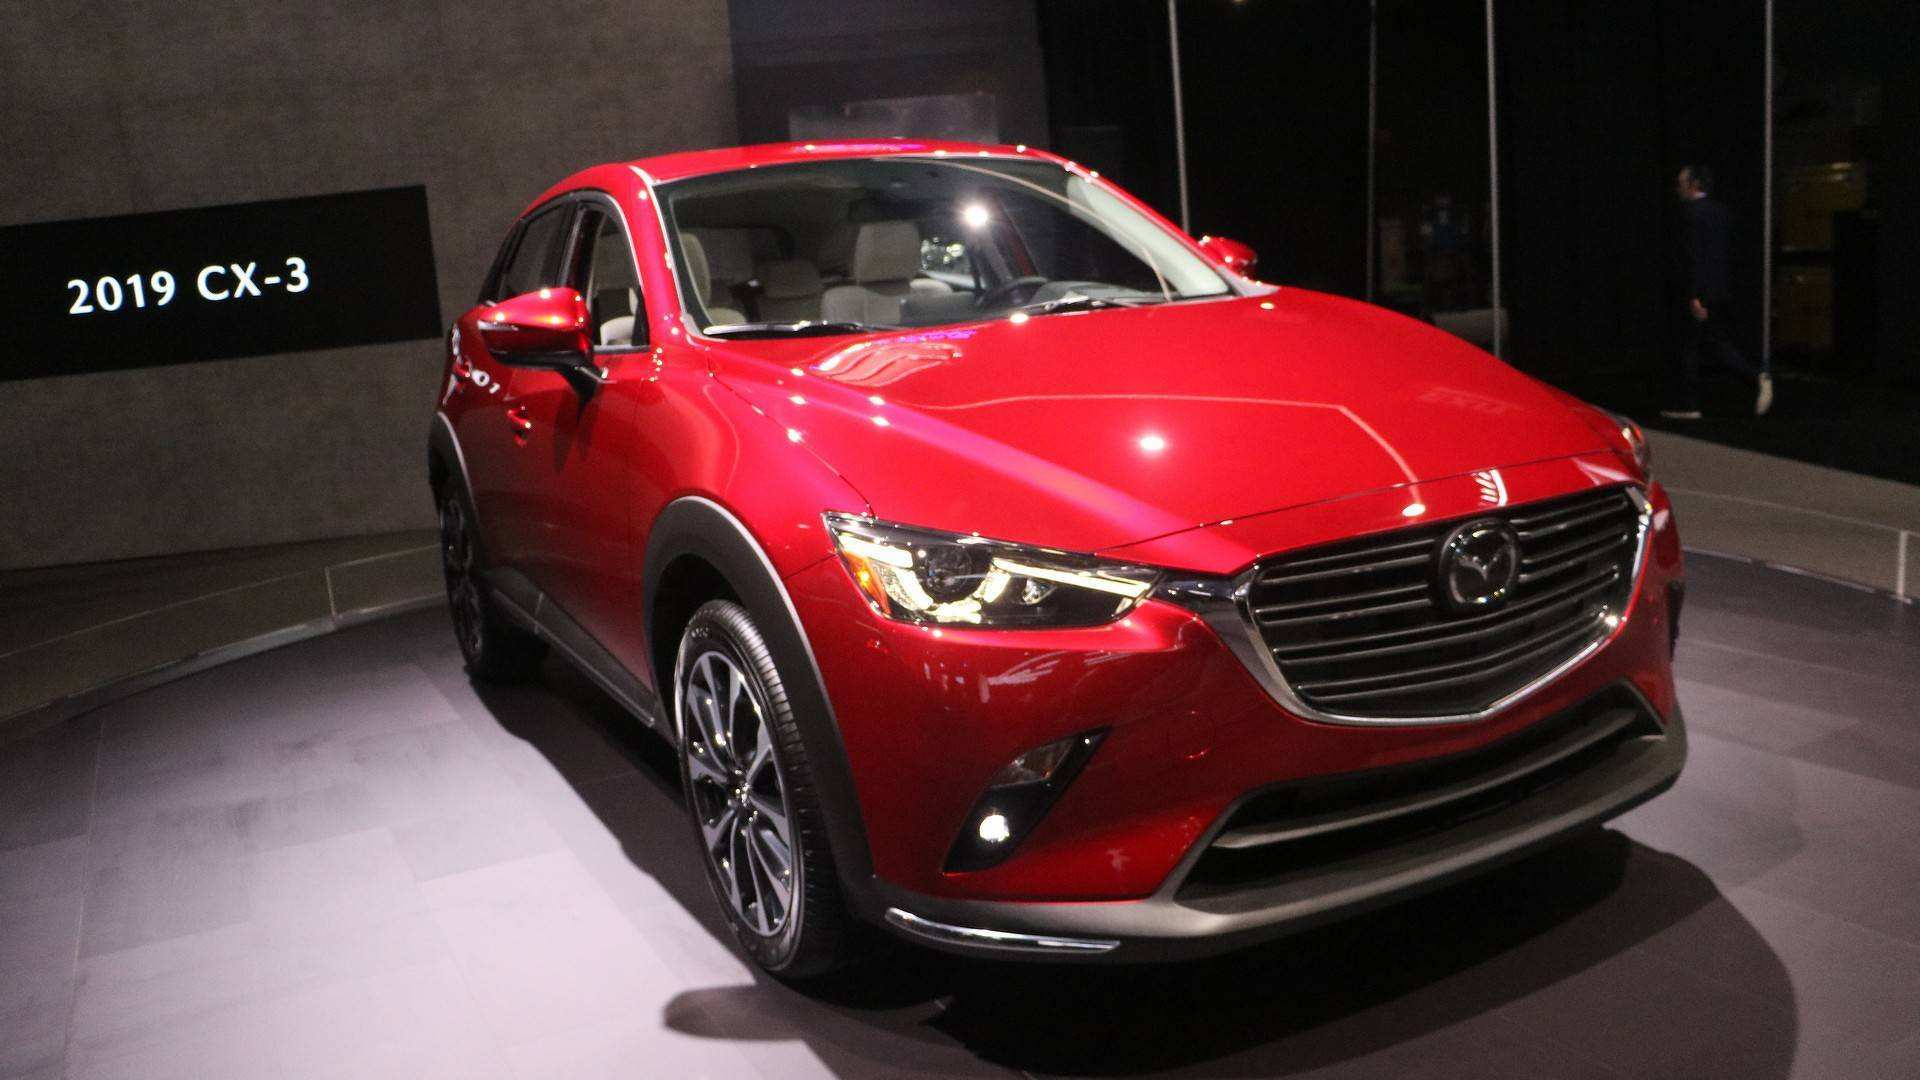 98 Best Review Mazda Cx 3 2020 Grey Style with Mazda Cx 3 2020 Grey